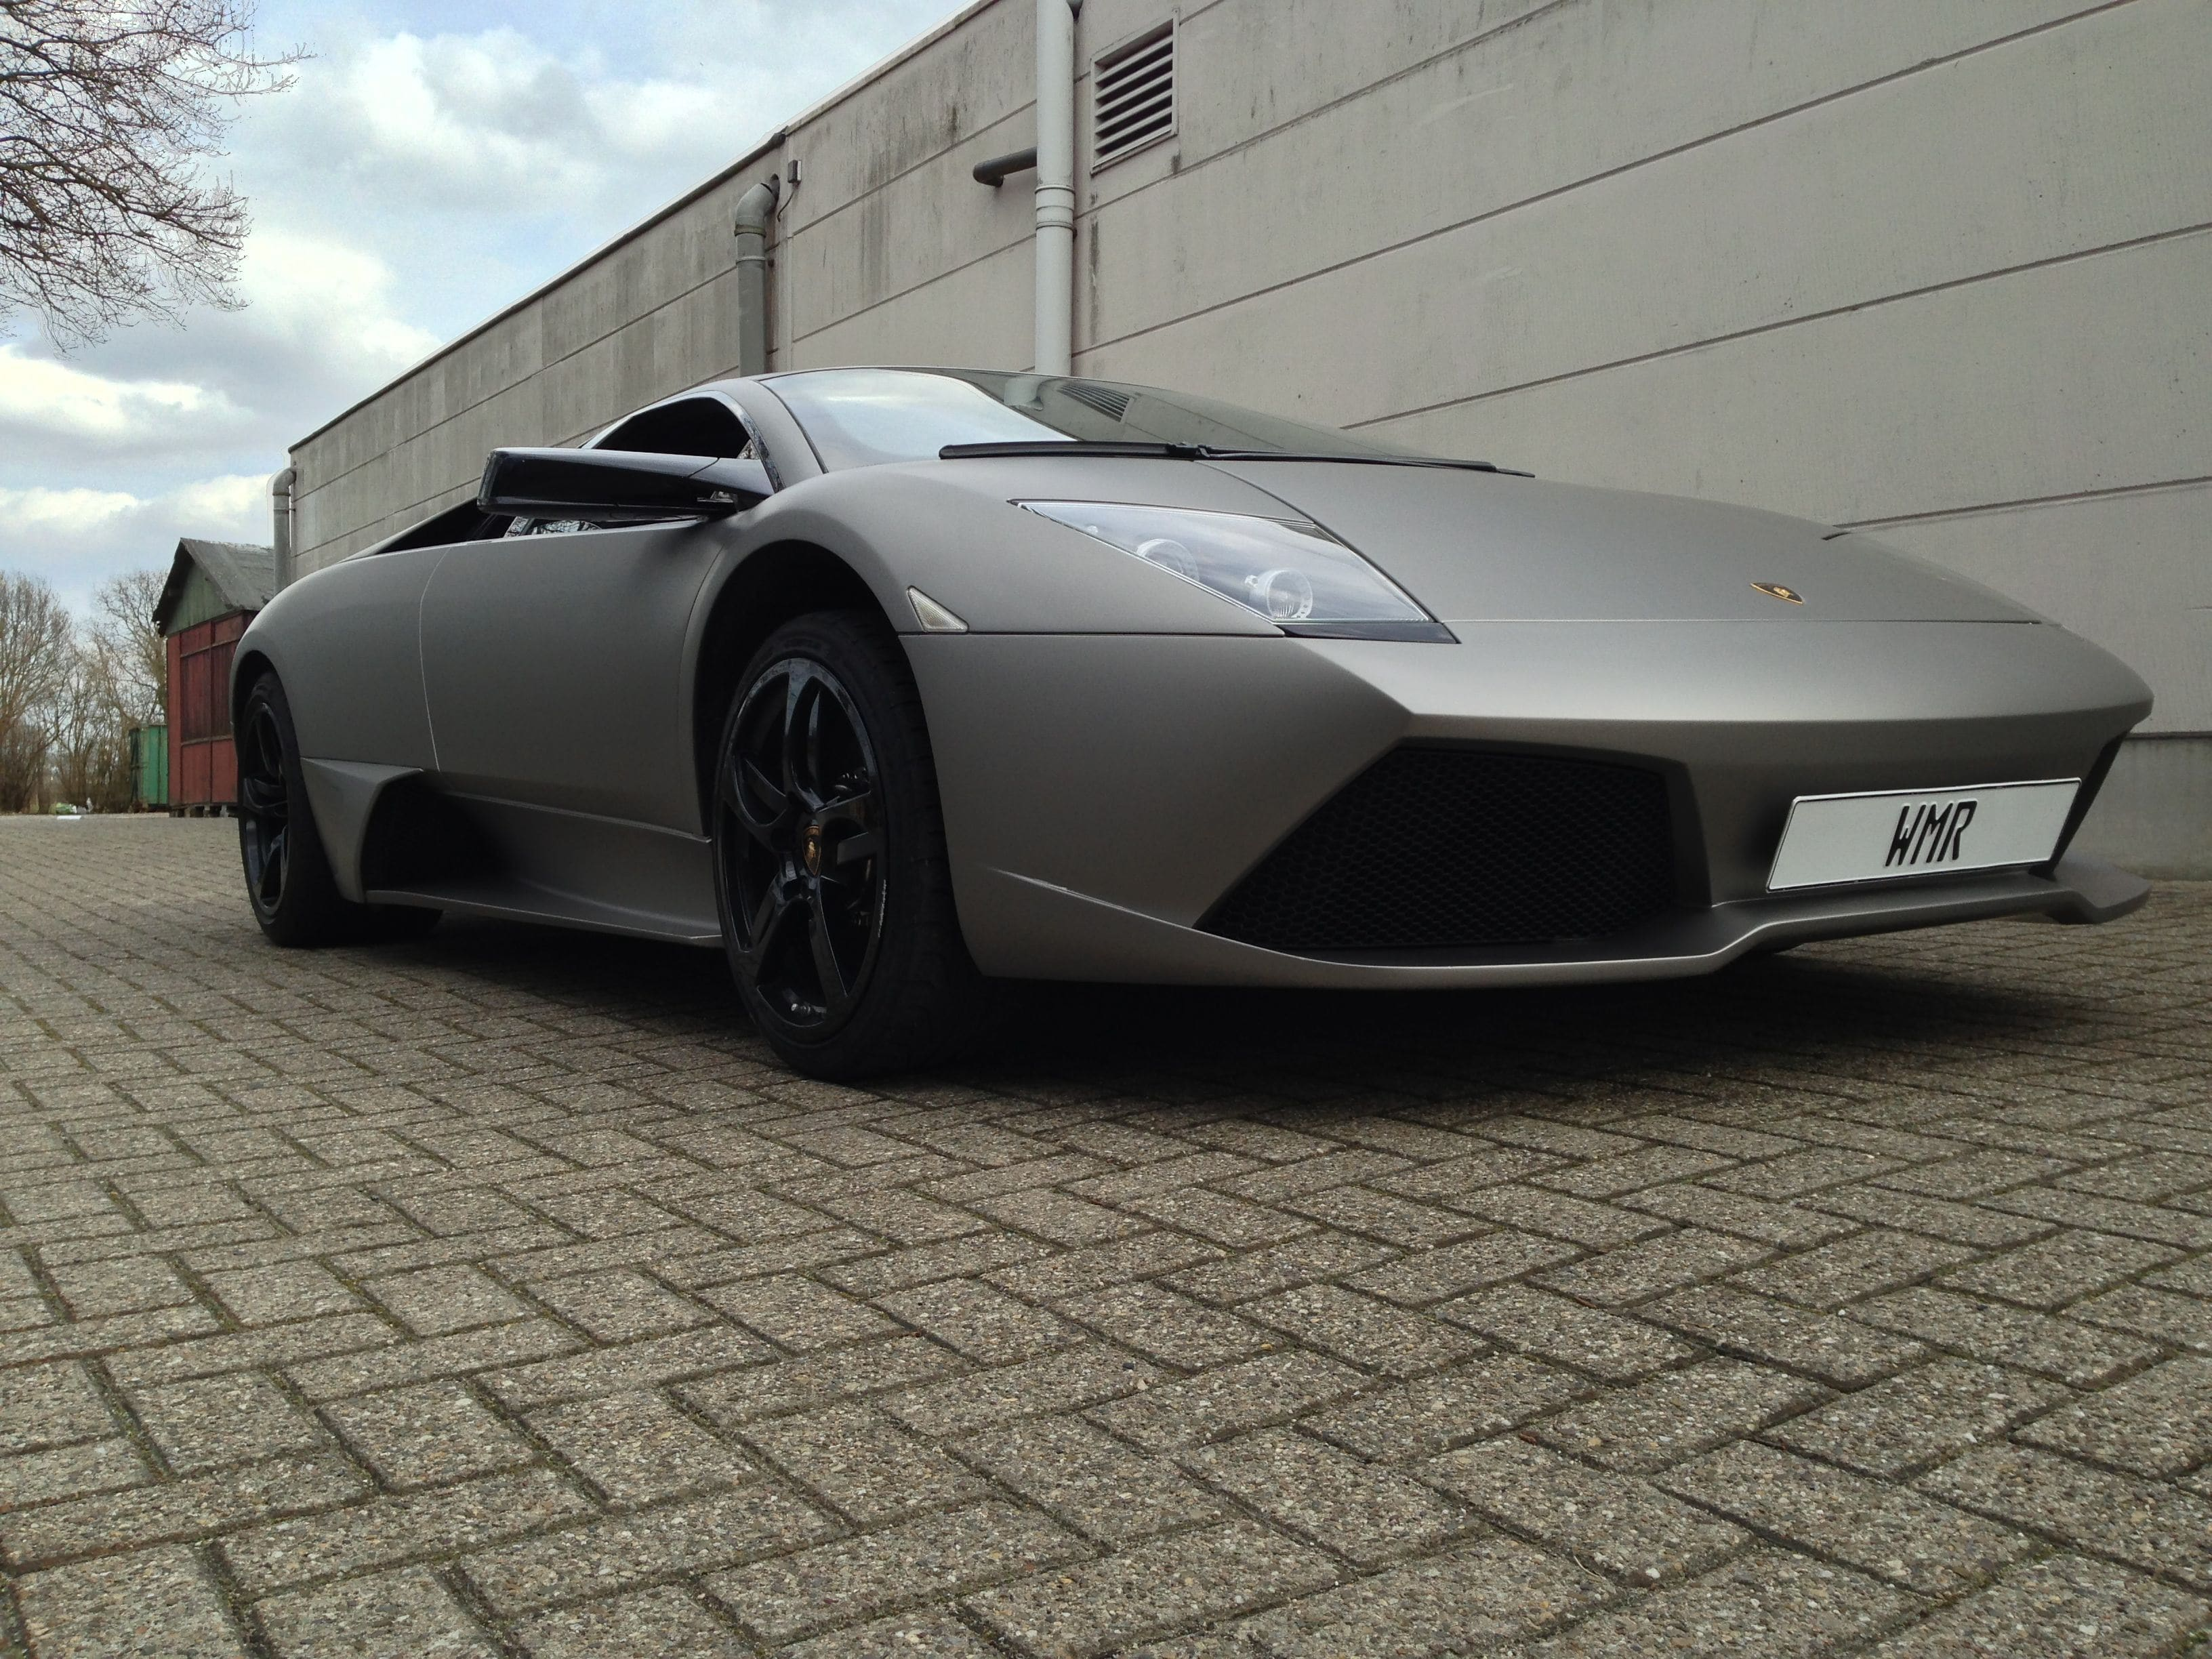 Lamborghini Murcialago LP670 met Gunpowder Wrap, Carwrapping door Wrapmyride.nu Foto-nr:5974, ©2021